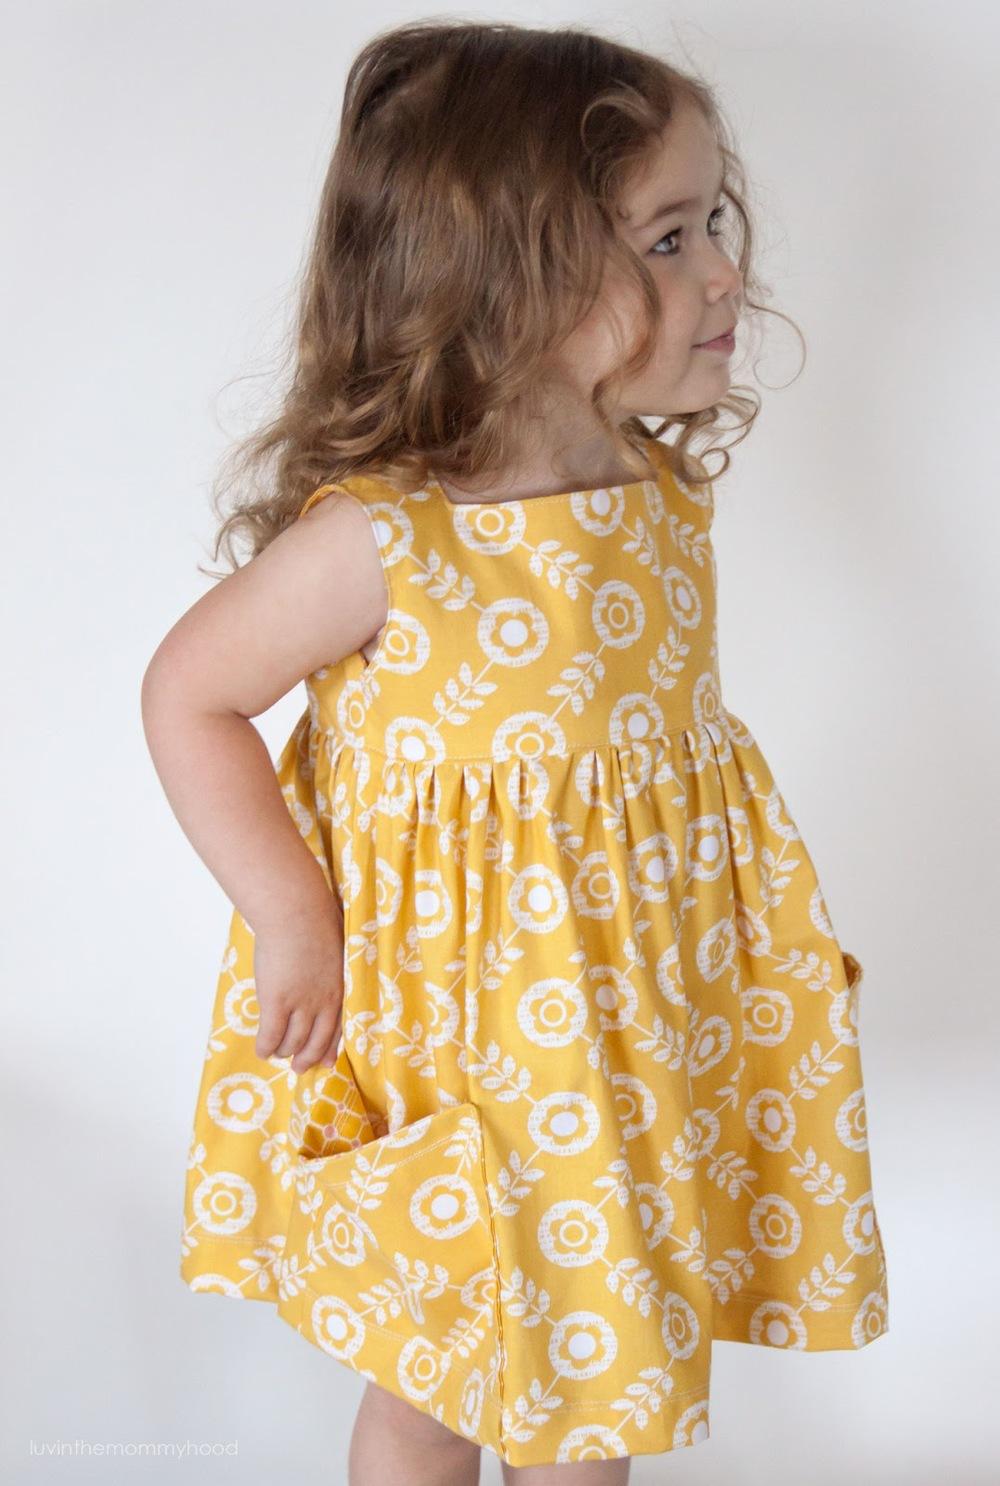 sally dress by luvinthemommyhood.com